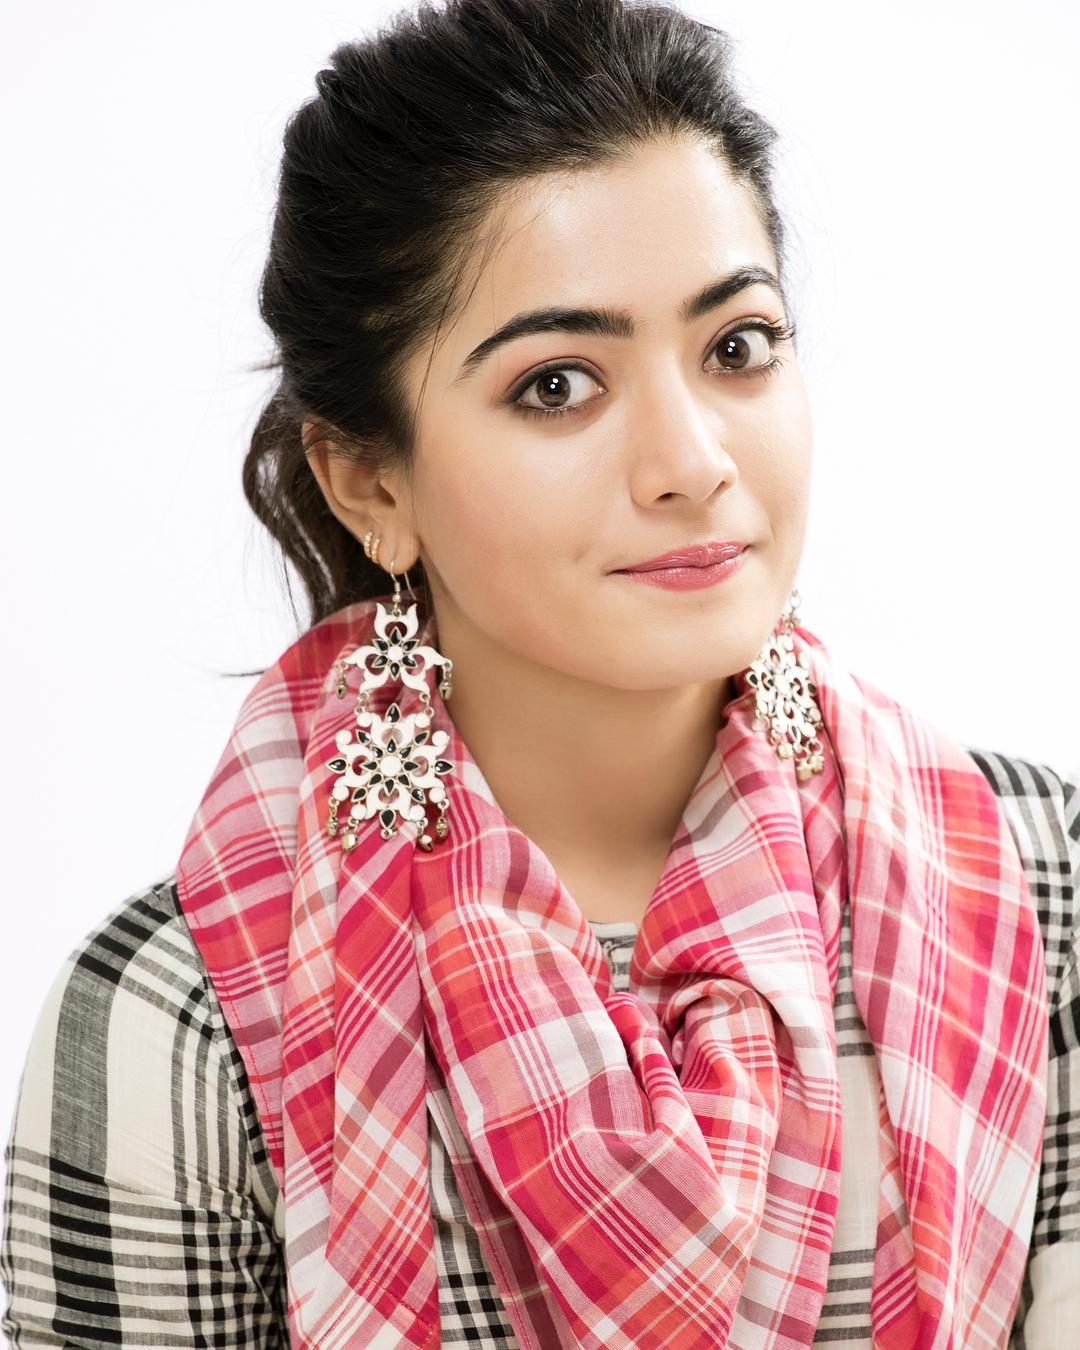 Rashmika Mandanna HD Image and Wallpapers, Cute image